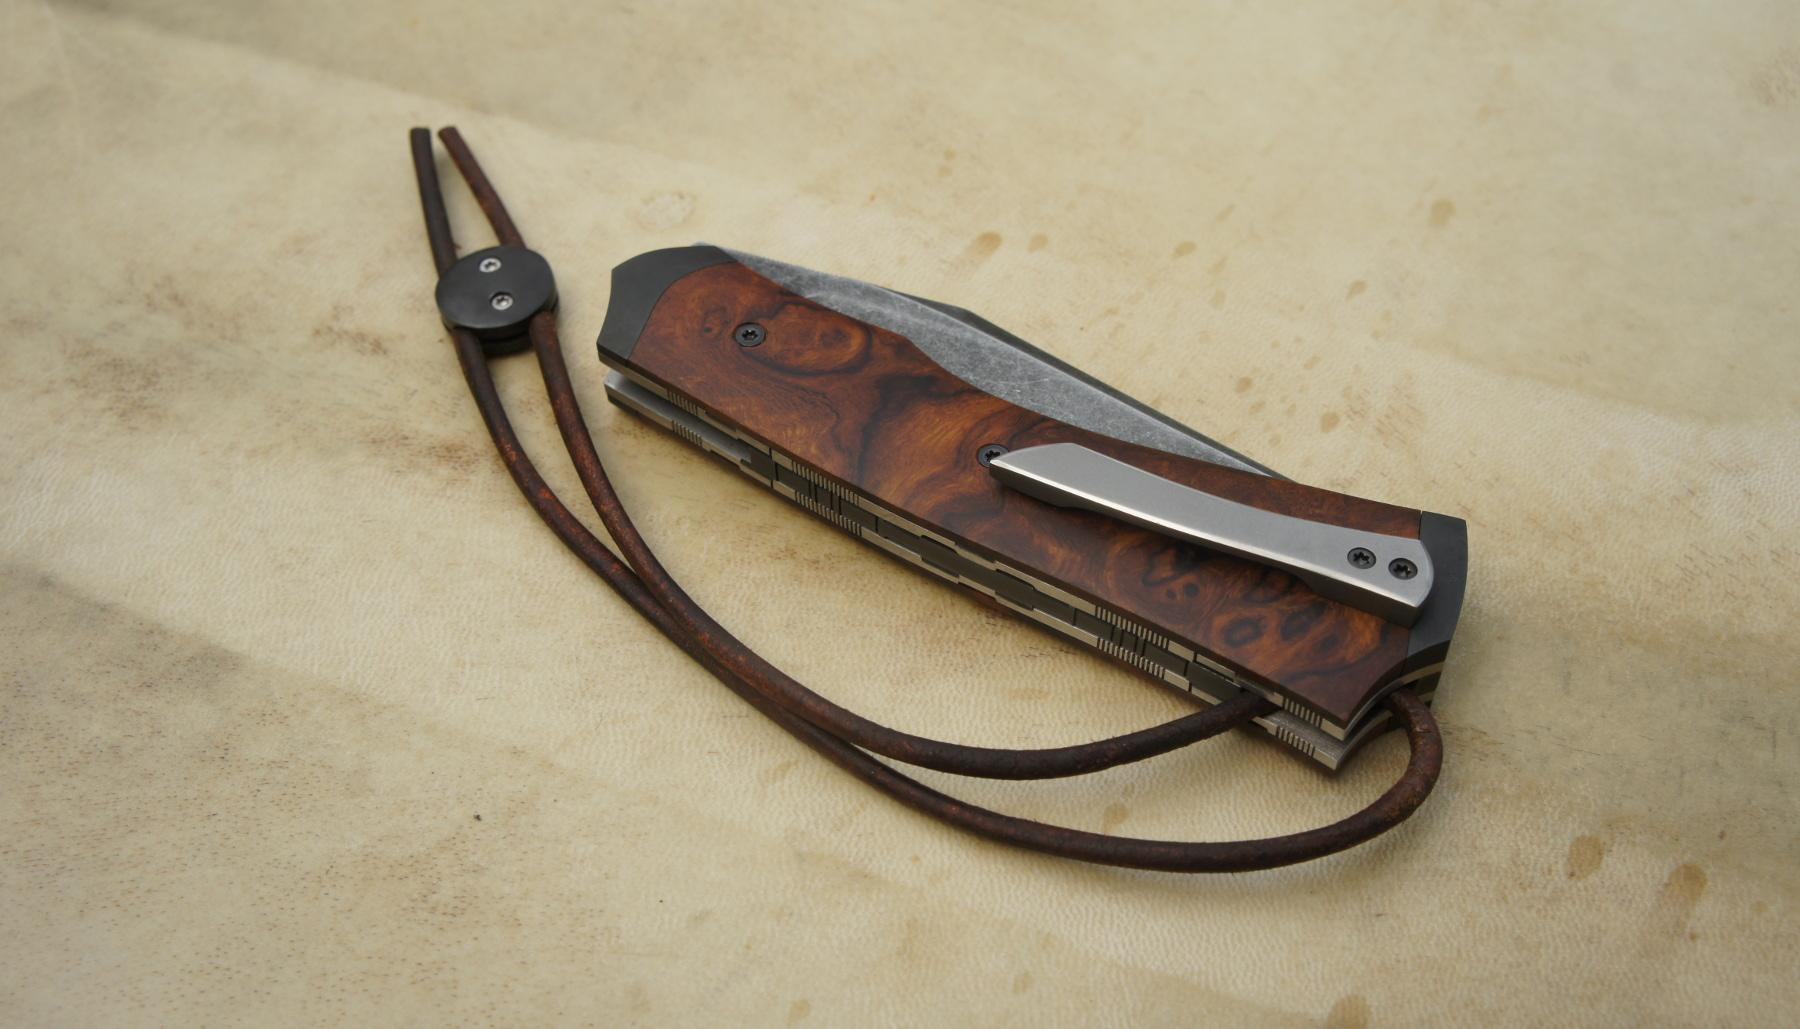 Tailleur 115w8 & loupe de bois de fer d'Arizona